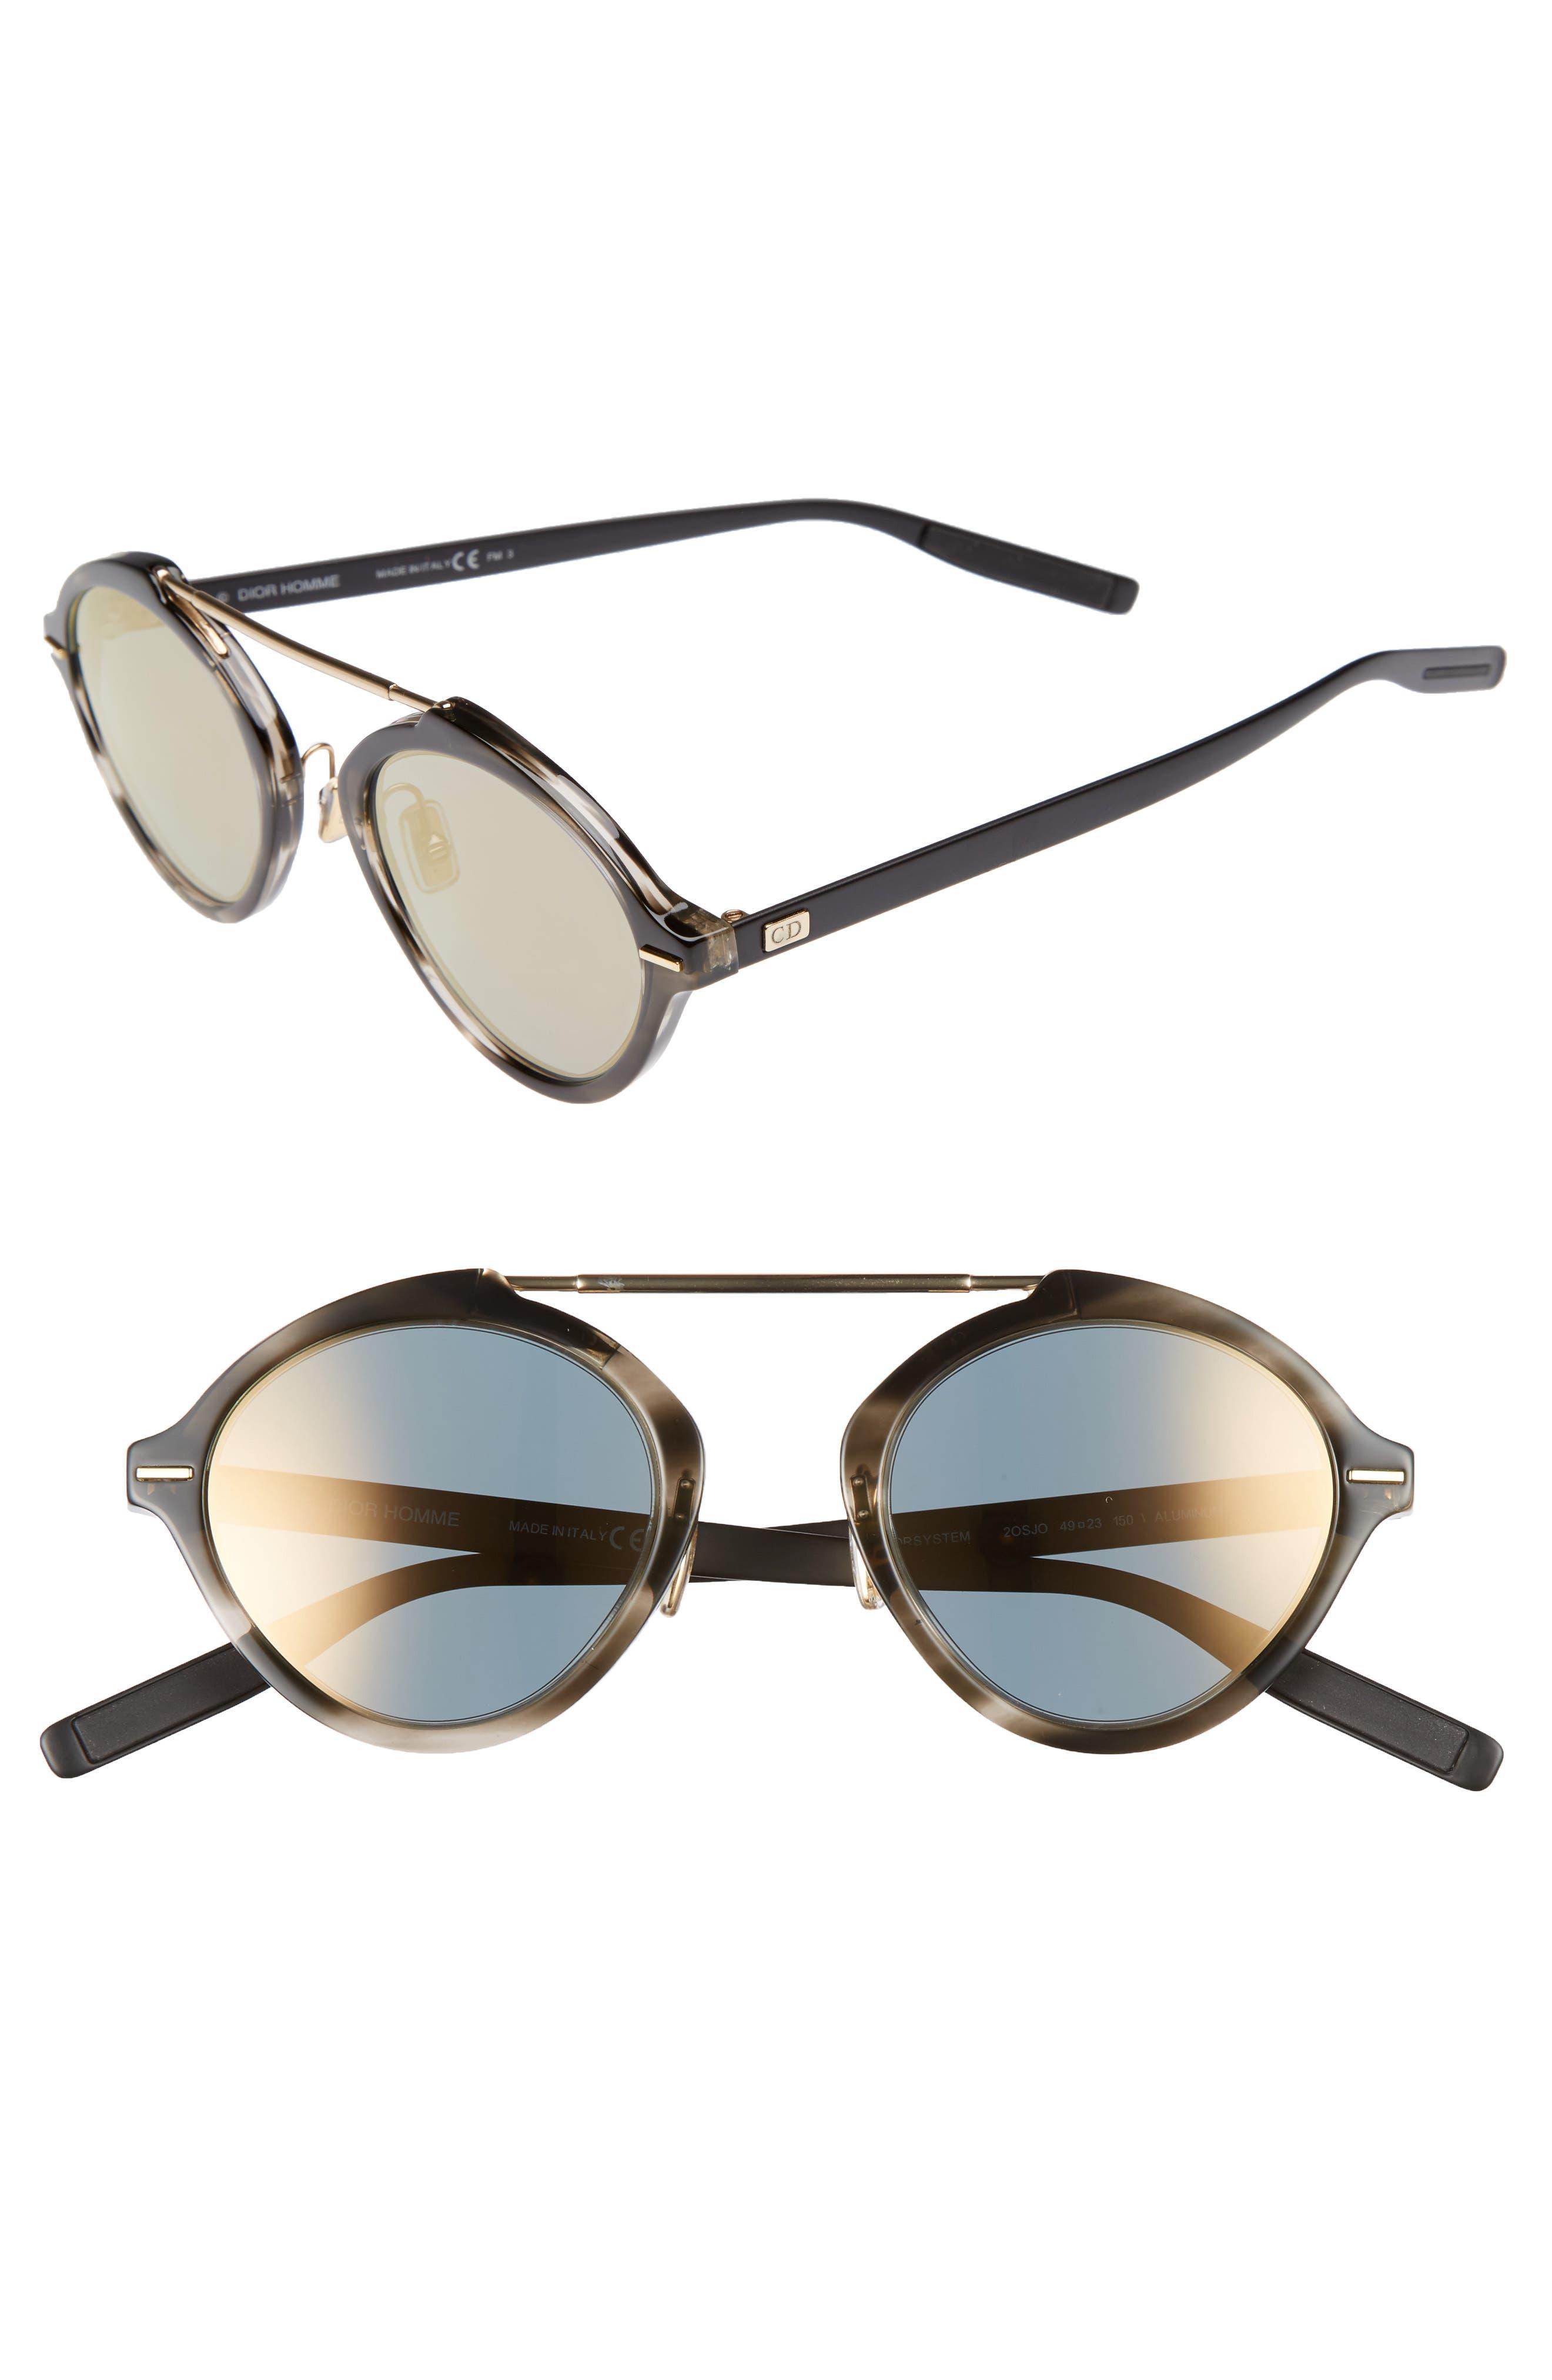 System 49mm Sunglasses,                         Main,                         color, HAVANA MATTER BLACK/ GREY